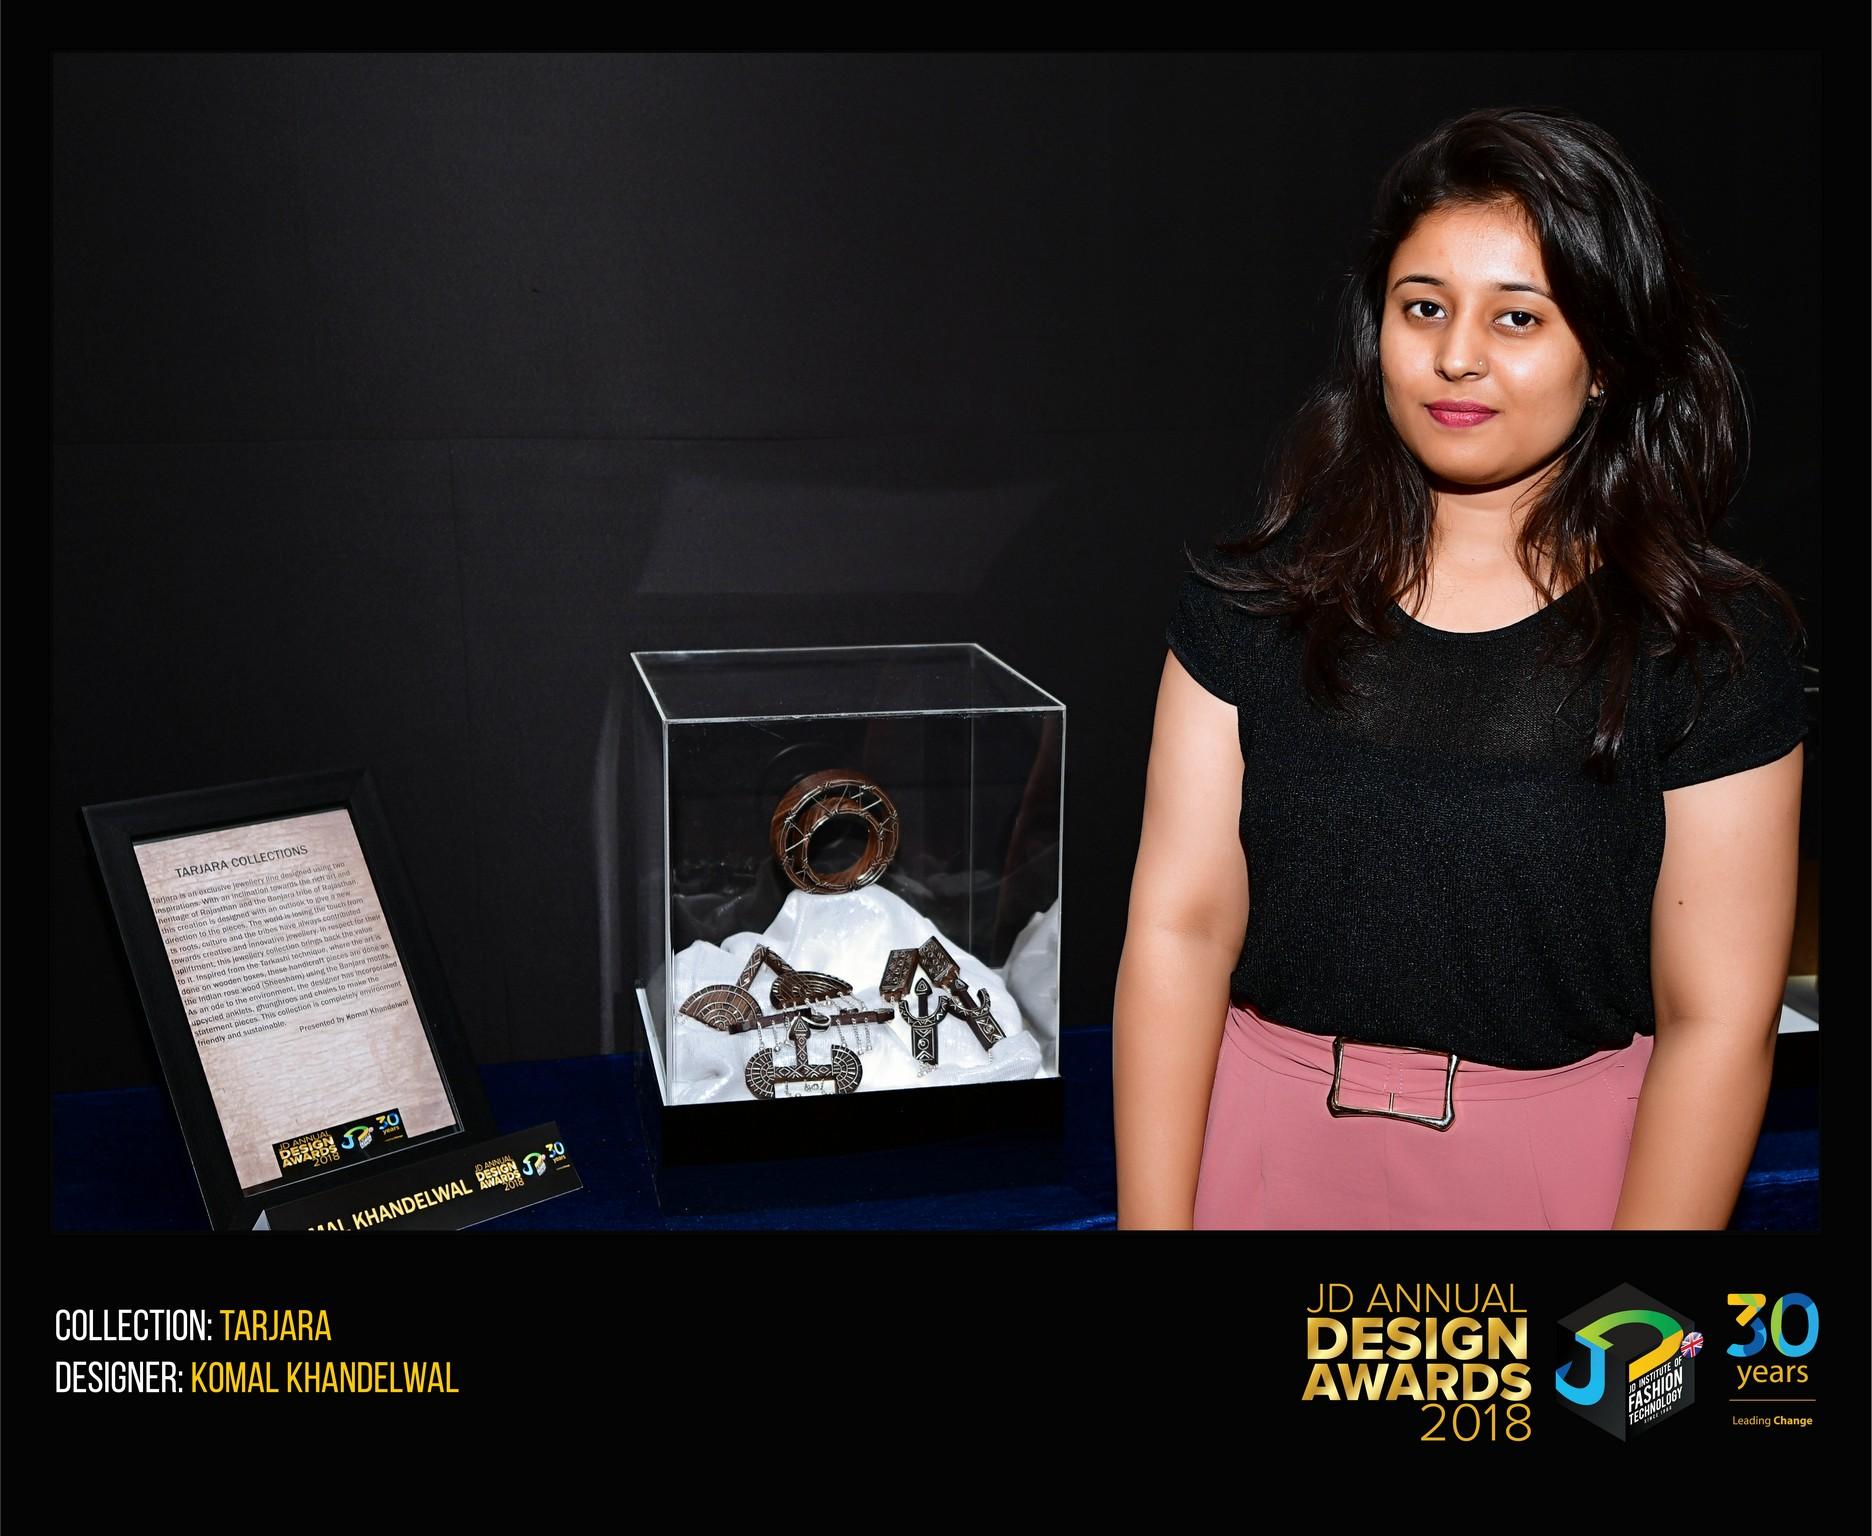 tarjara - Tarjara1 - Tarjara – Change – JD Annual Design Awards 2018